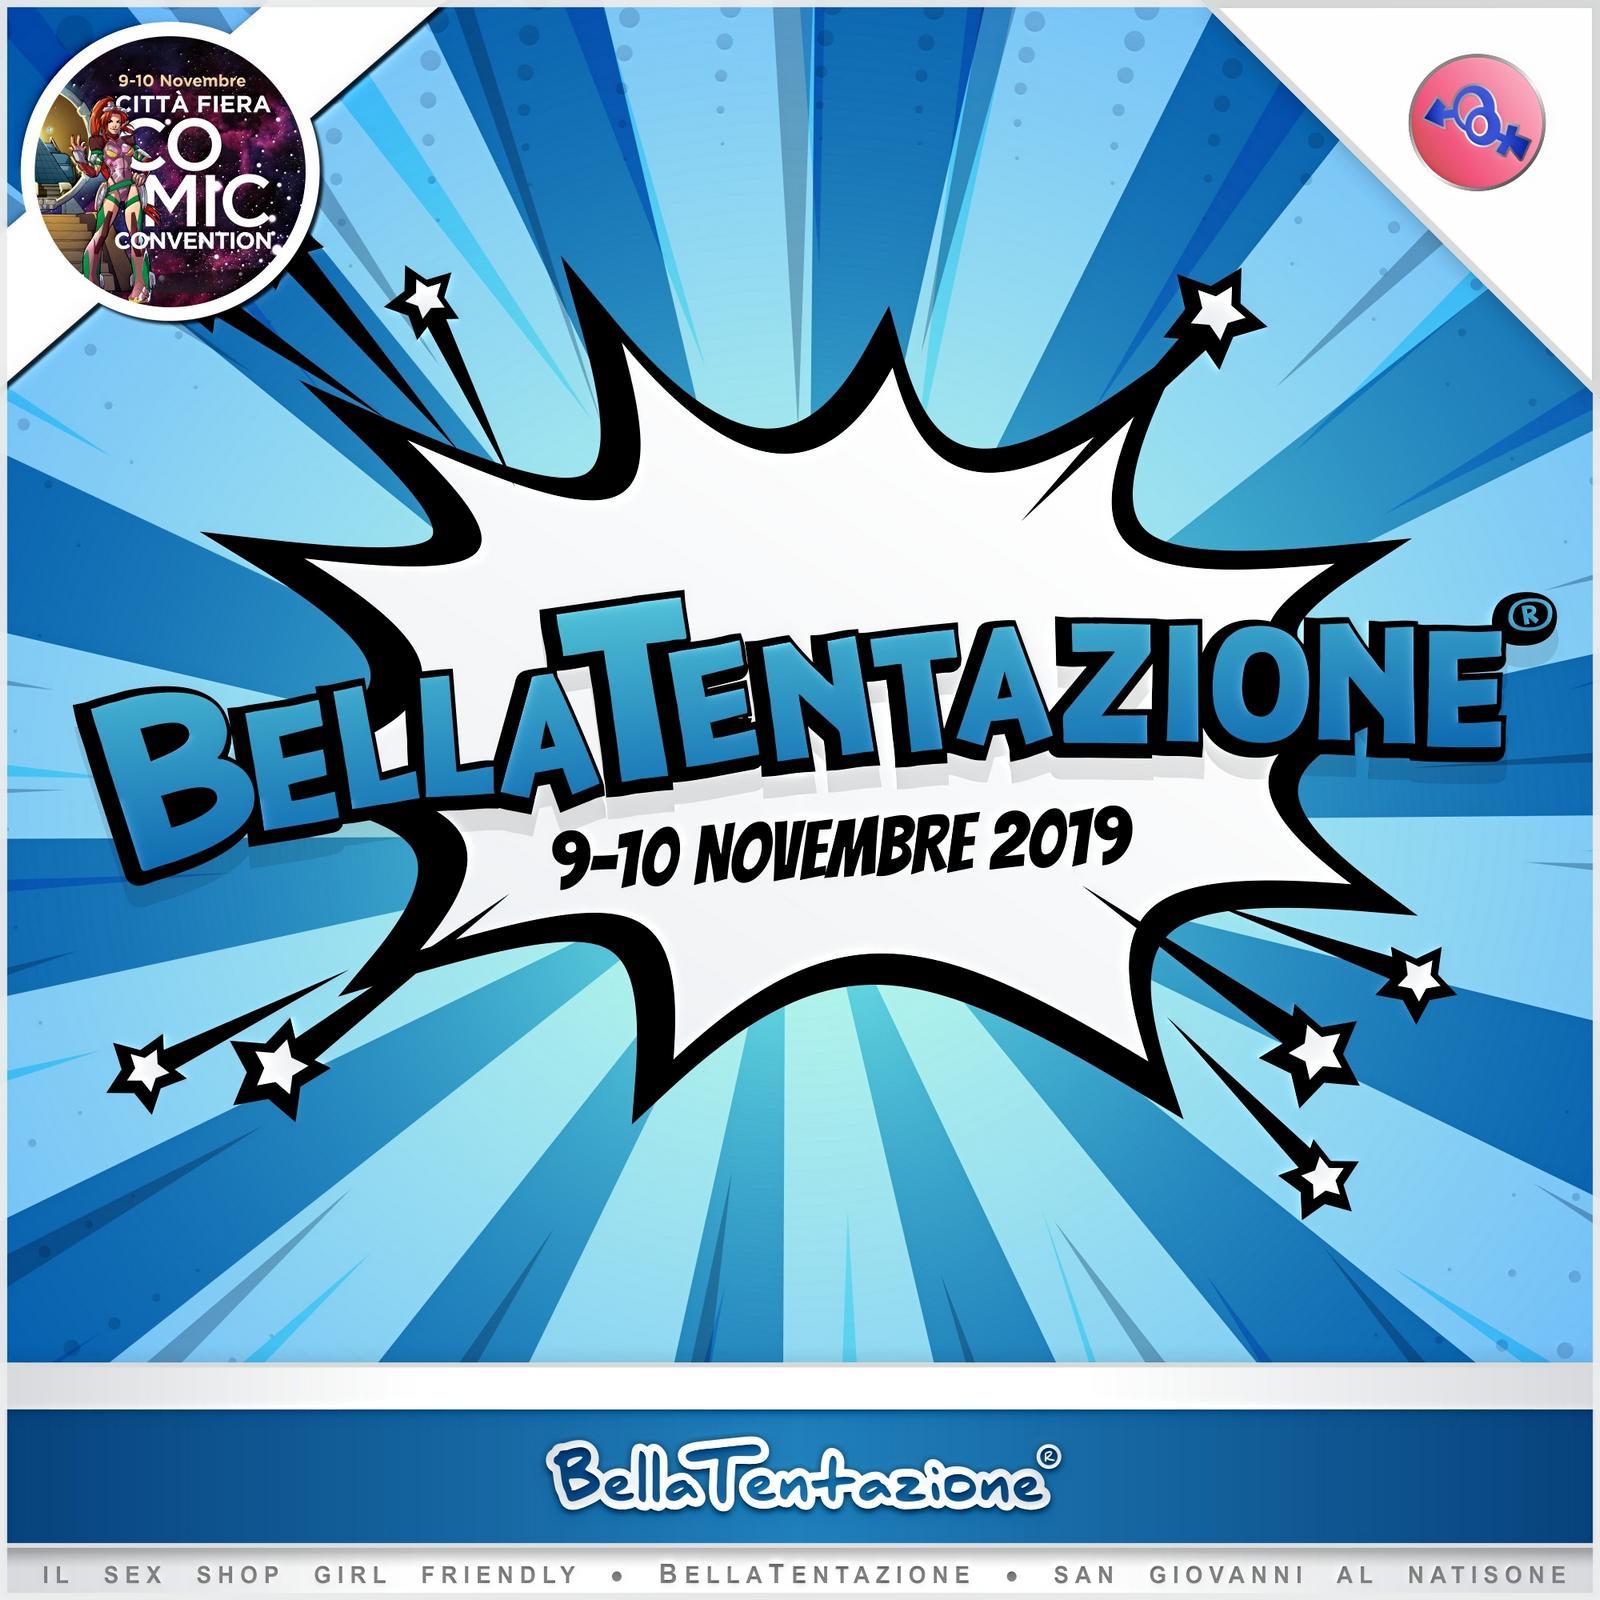 CITTÀ FIERA – COMIC CONVENTION 2019